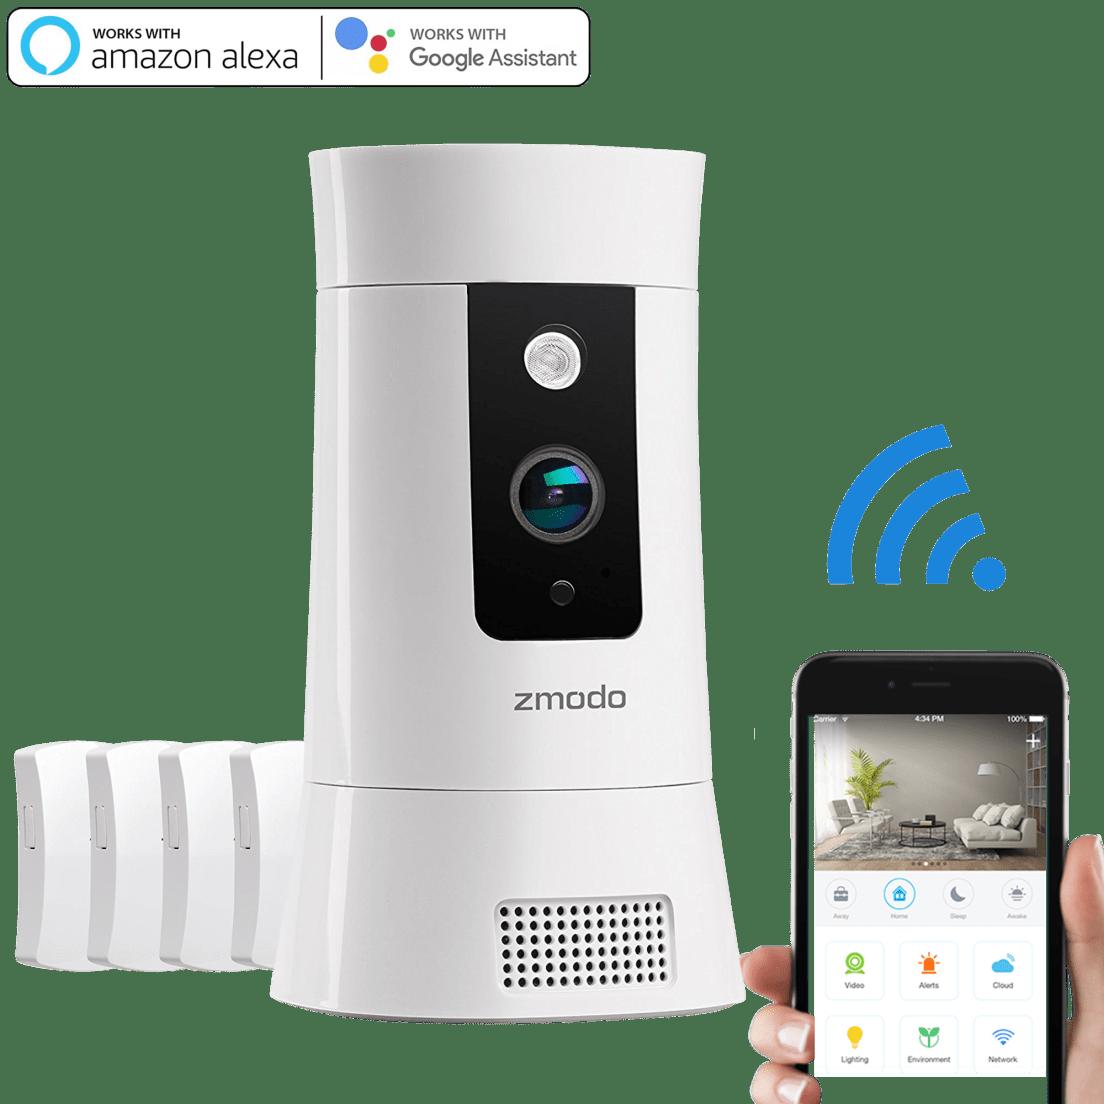 Zmodo Pivot Cloud 350° Rotating Smart WiFi Camera with Door/Window